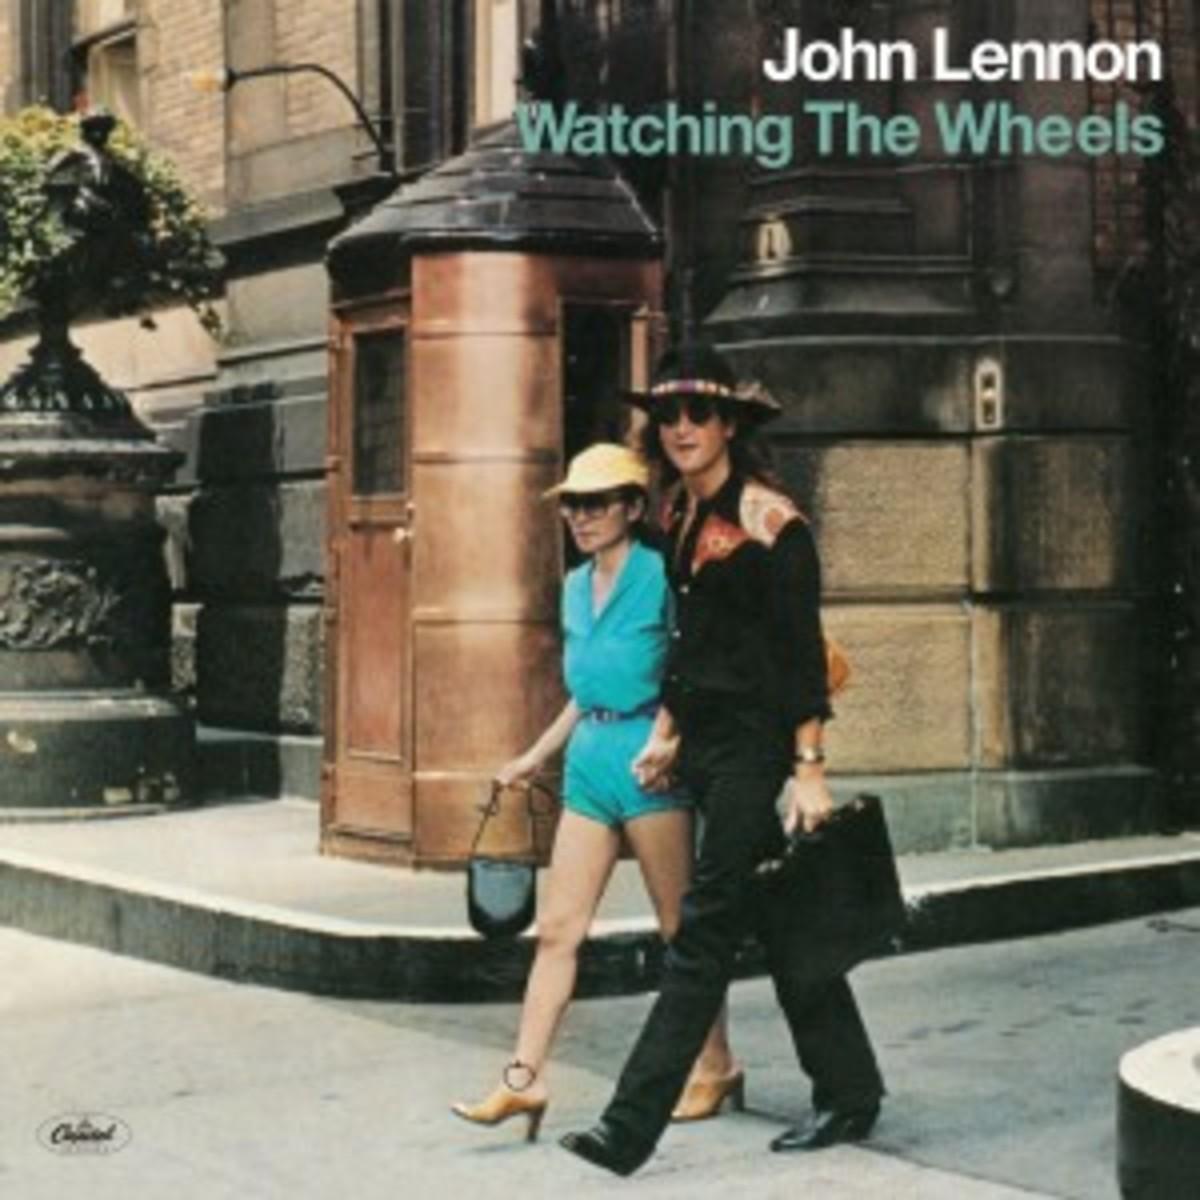 JohnLennon_WatchingWheels_Sleeve_v3.indd